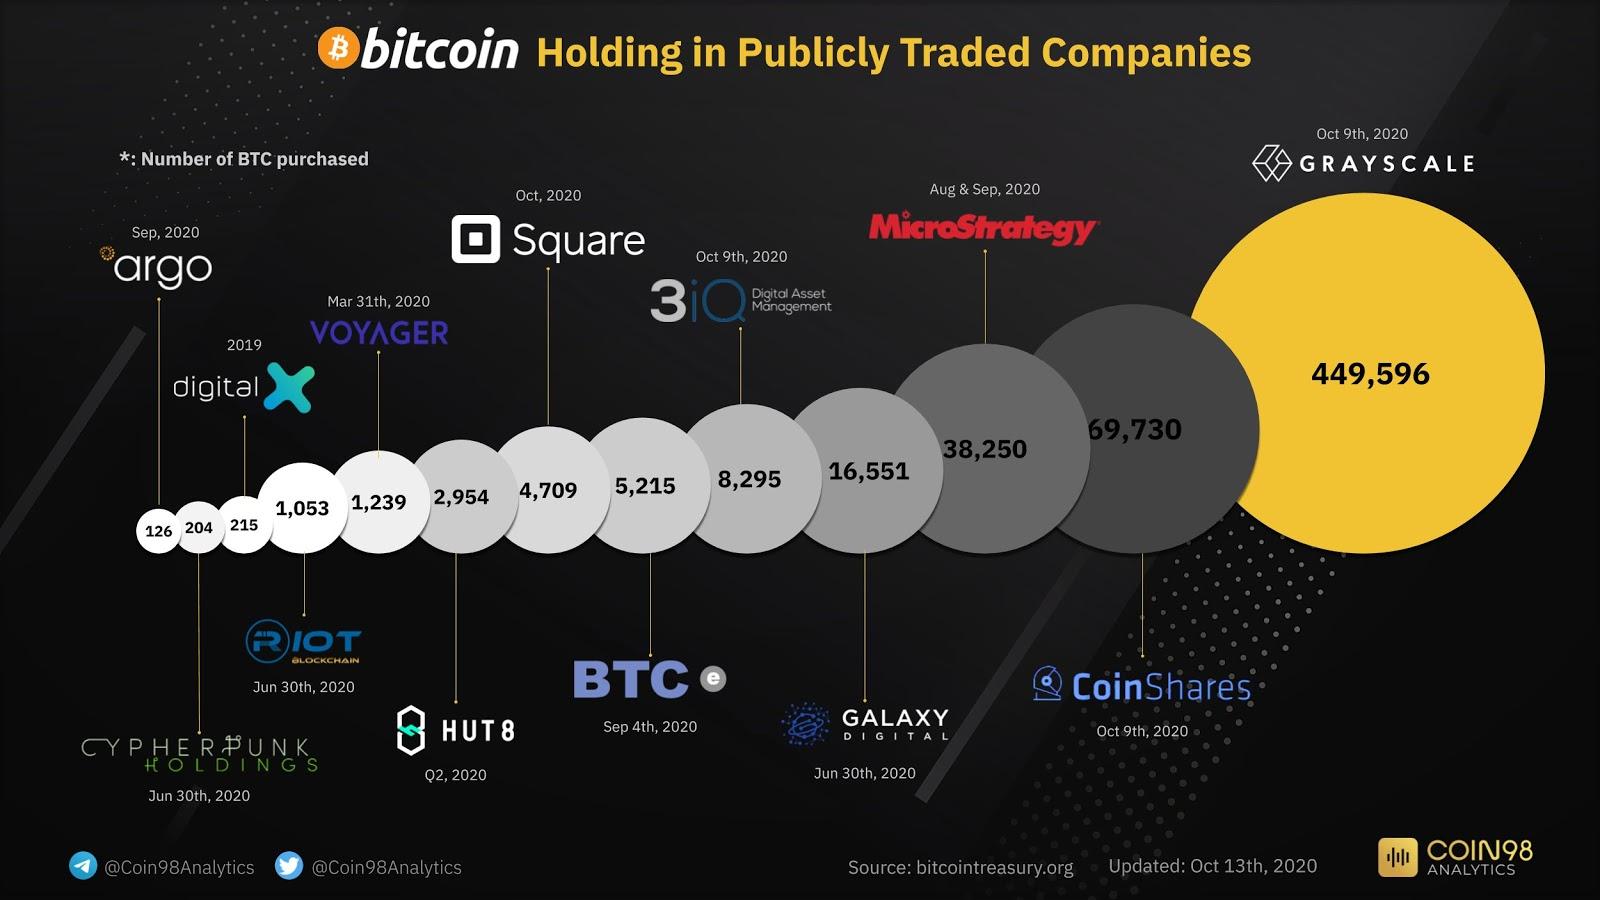 Public companies' Bitcoin holdings